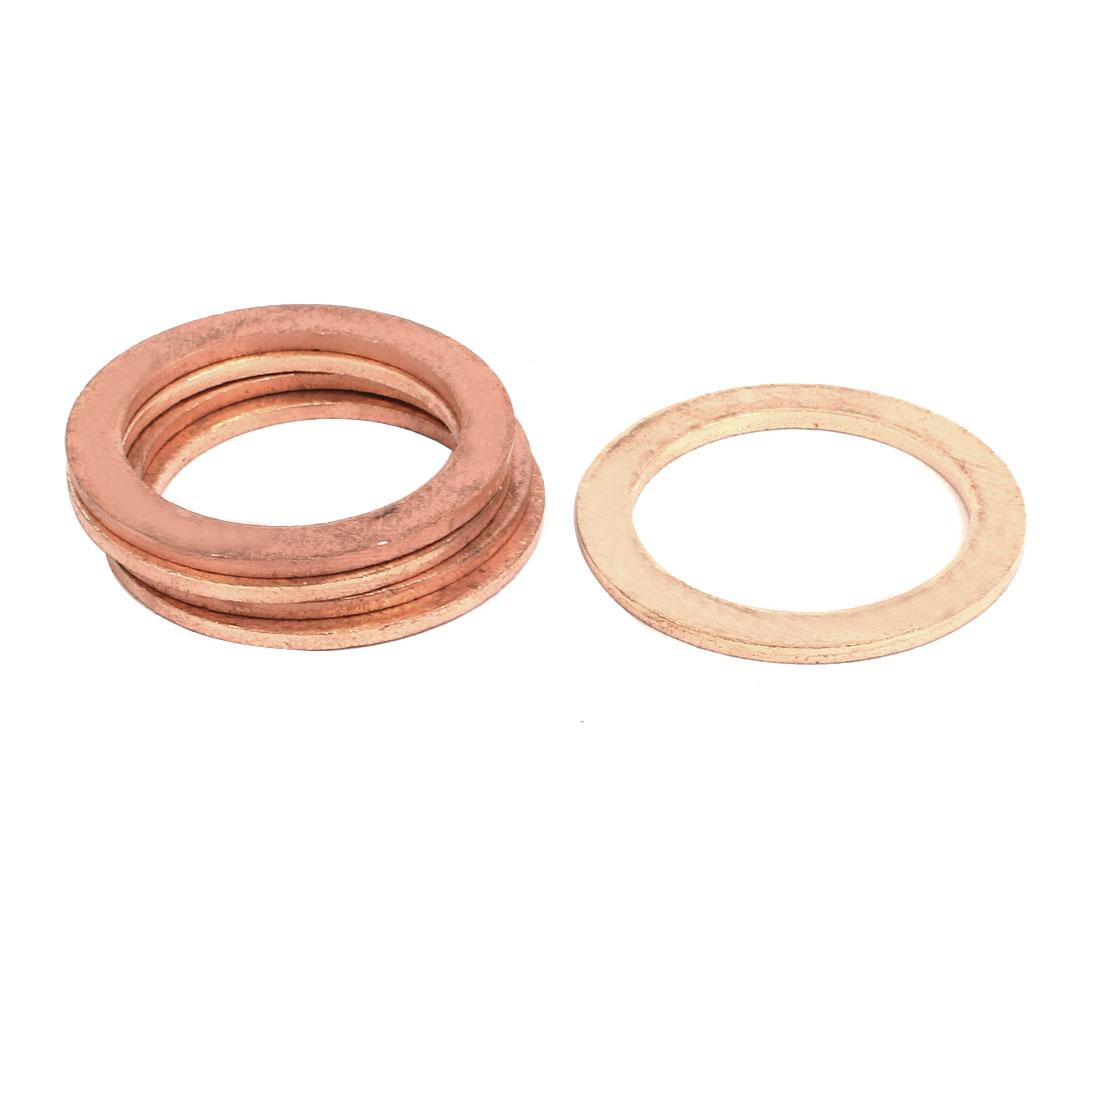 4pcs 30mmx40mmx2mm Copper Flat Ring Sealing Crush Washer Gasket